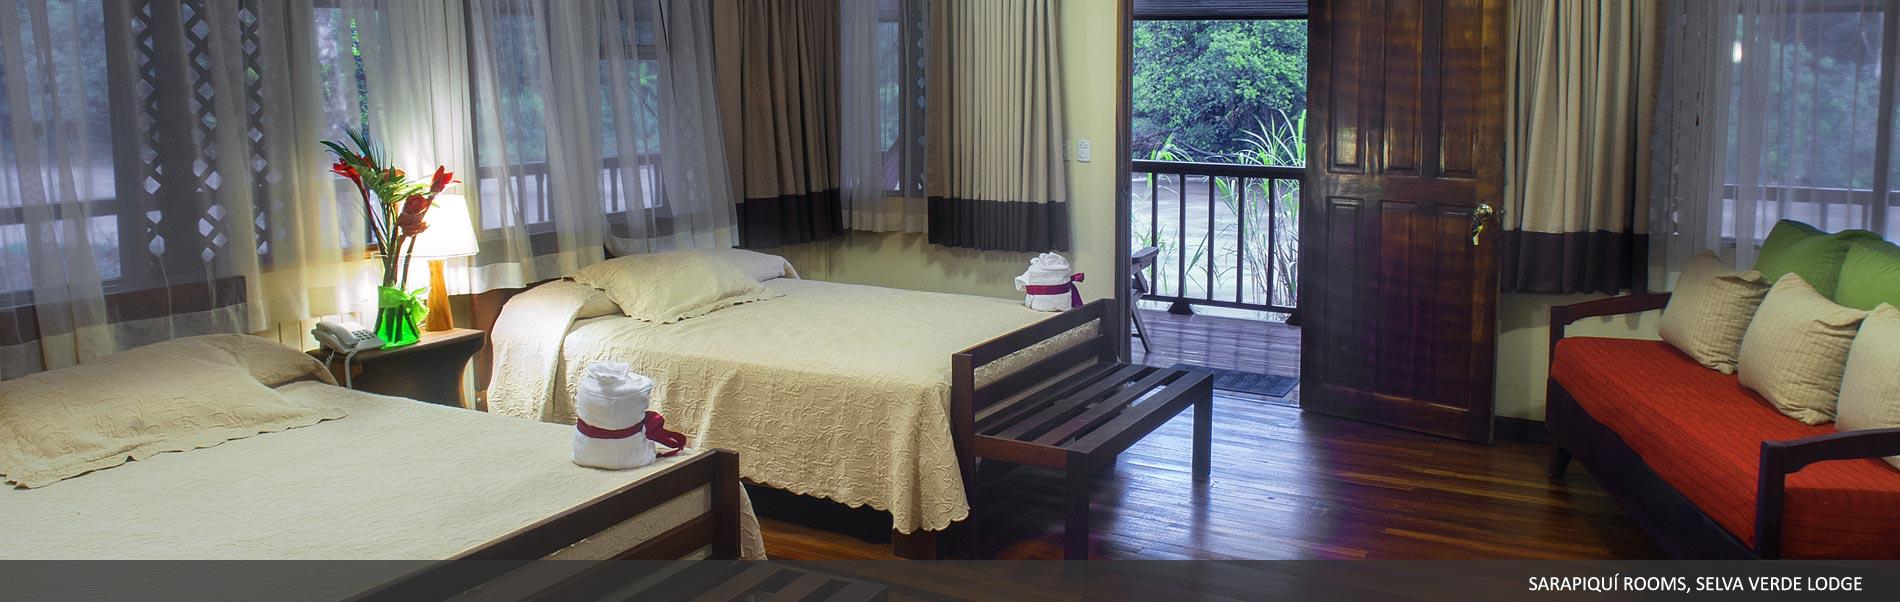 sarapiqui-room-main.jpg